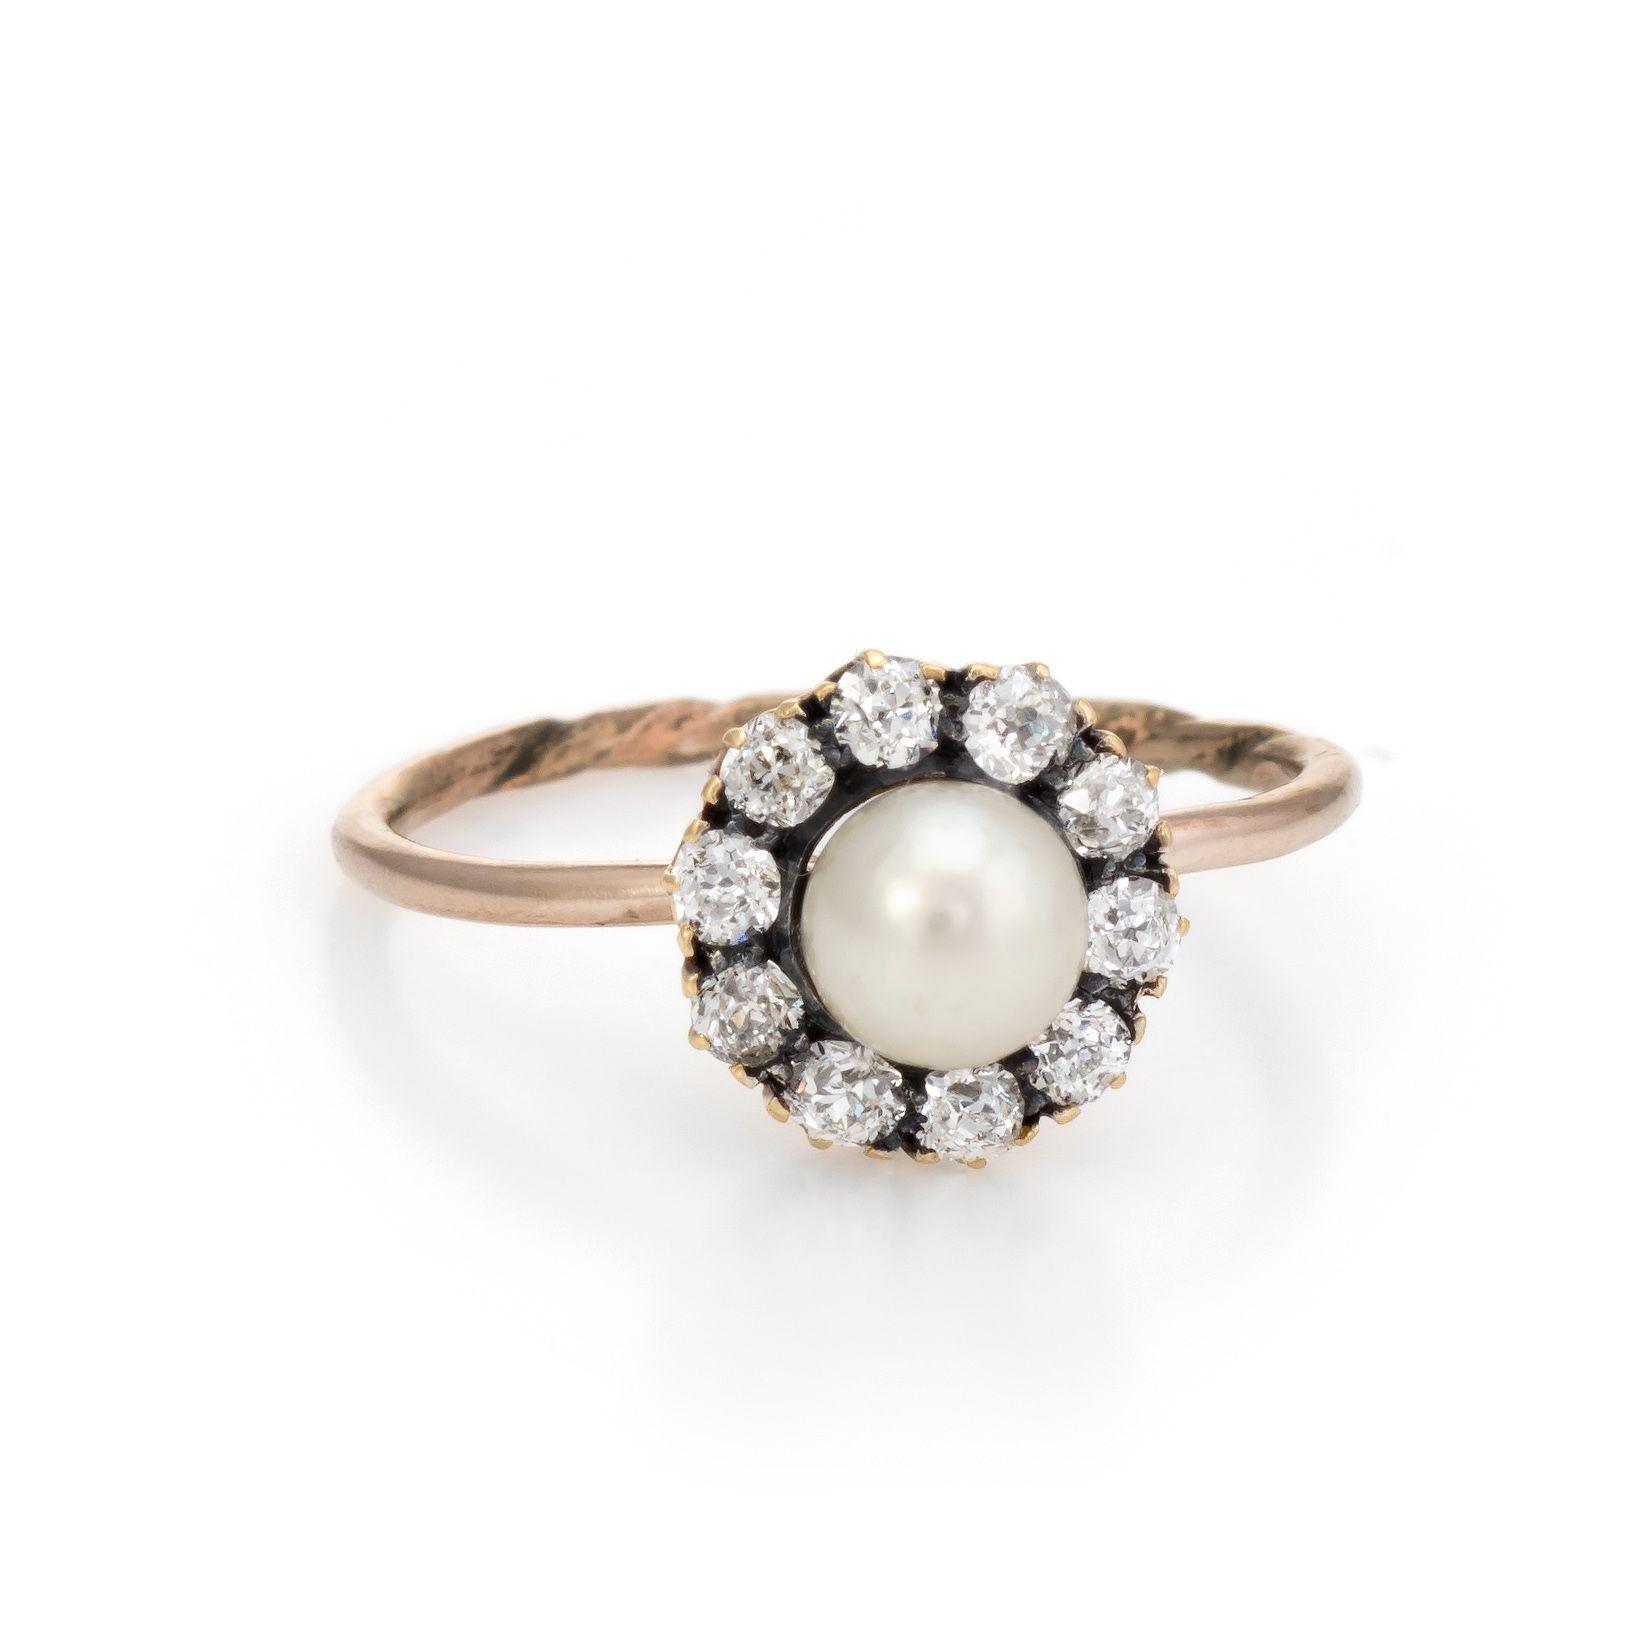 Antique Victorian Diamond Pearl Conversion Ring Halo 10 Karat Gold Fine Jewelry 5 75 Jewelry Halo Diamond Ring Fine Jewelry